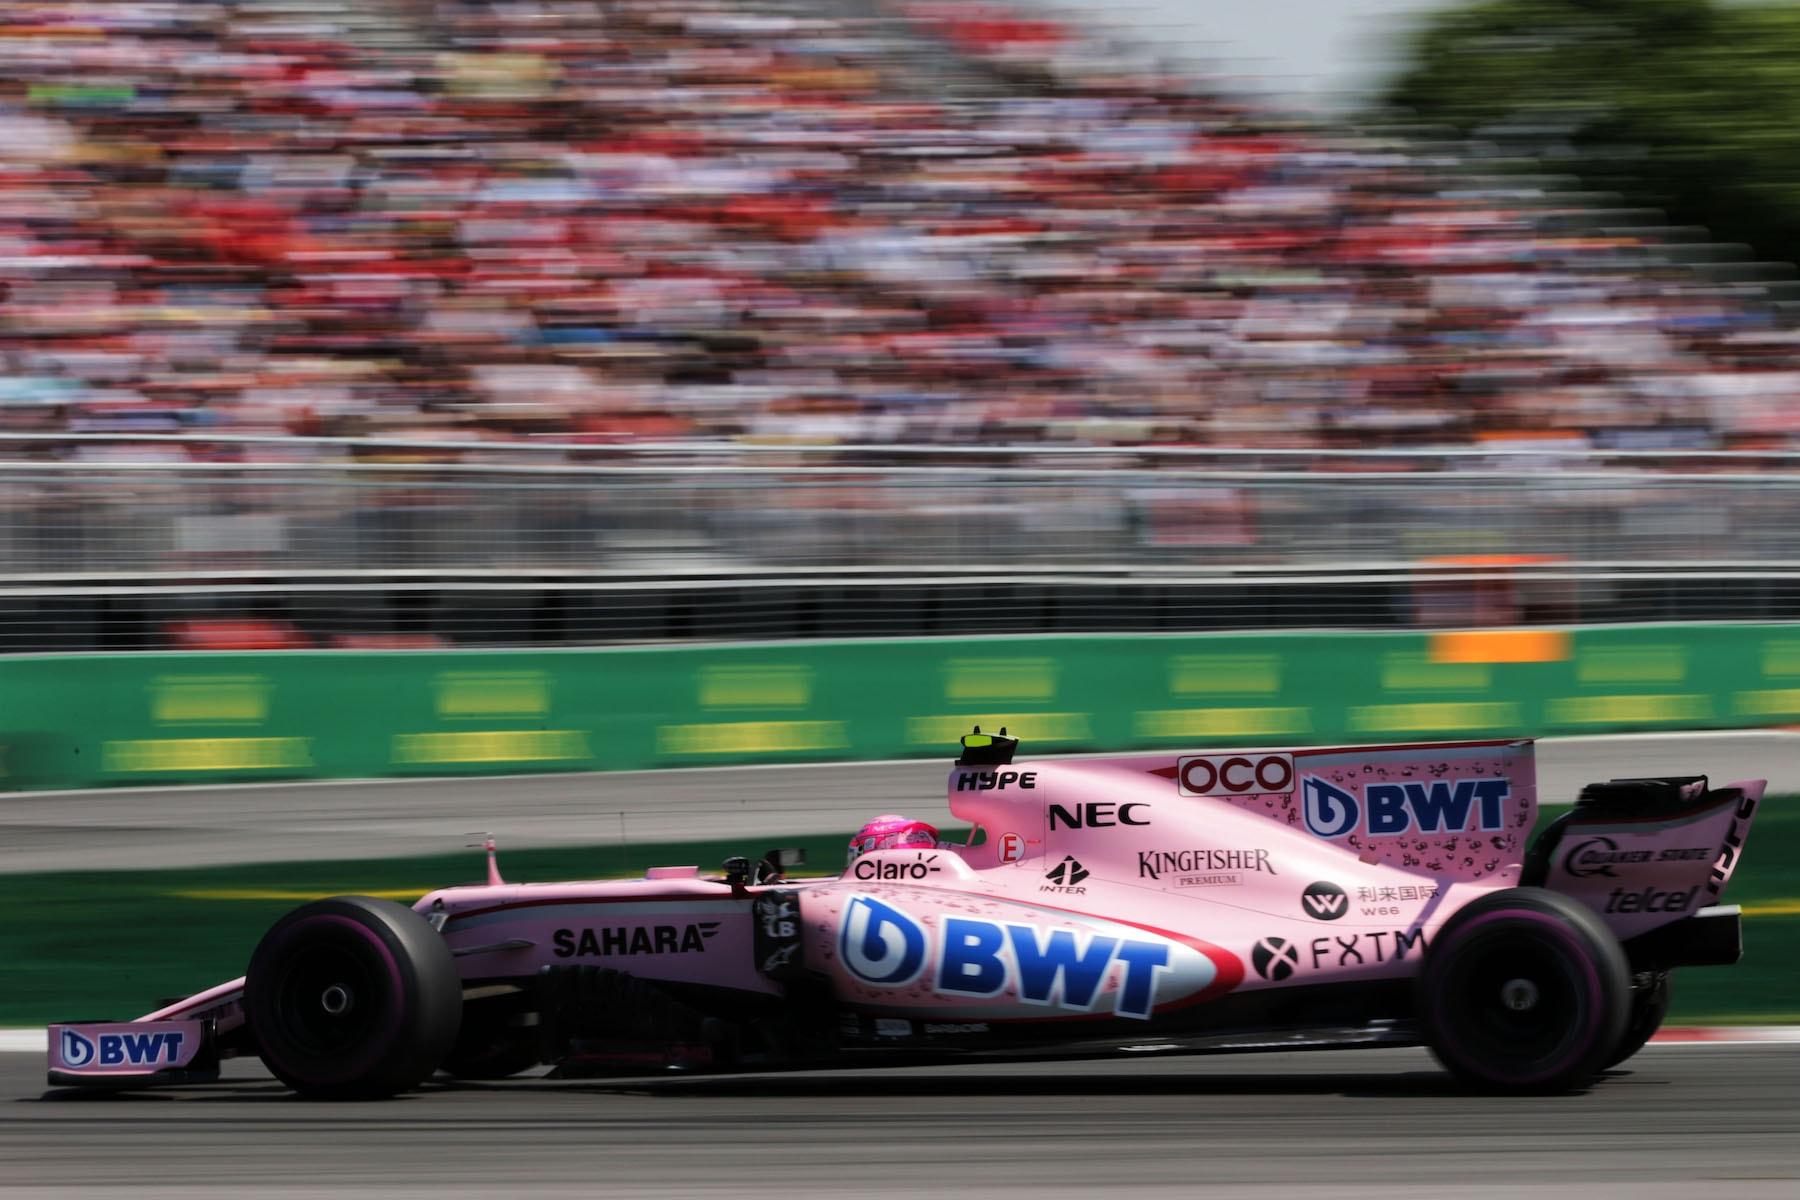 G 2017 Esteban Ocon | Force India VJM10 | 2017 Canadian GP P6 1 copy.jpg